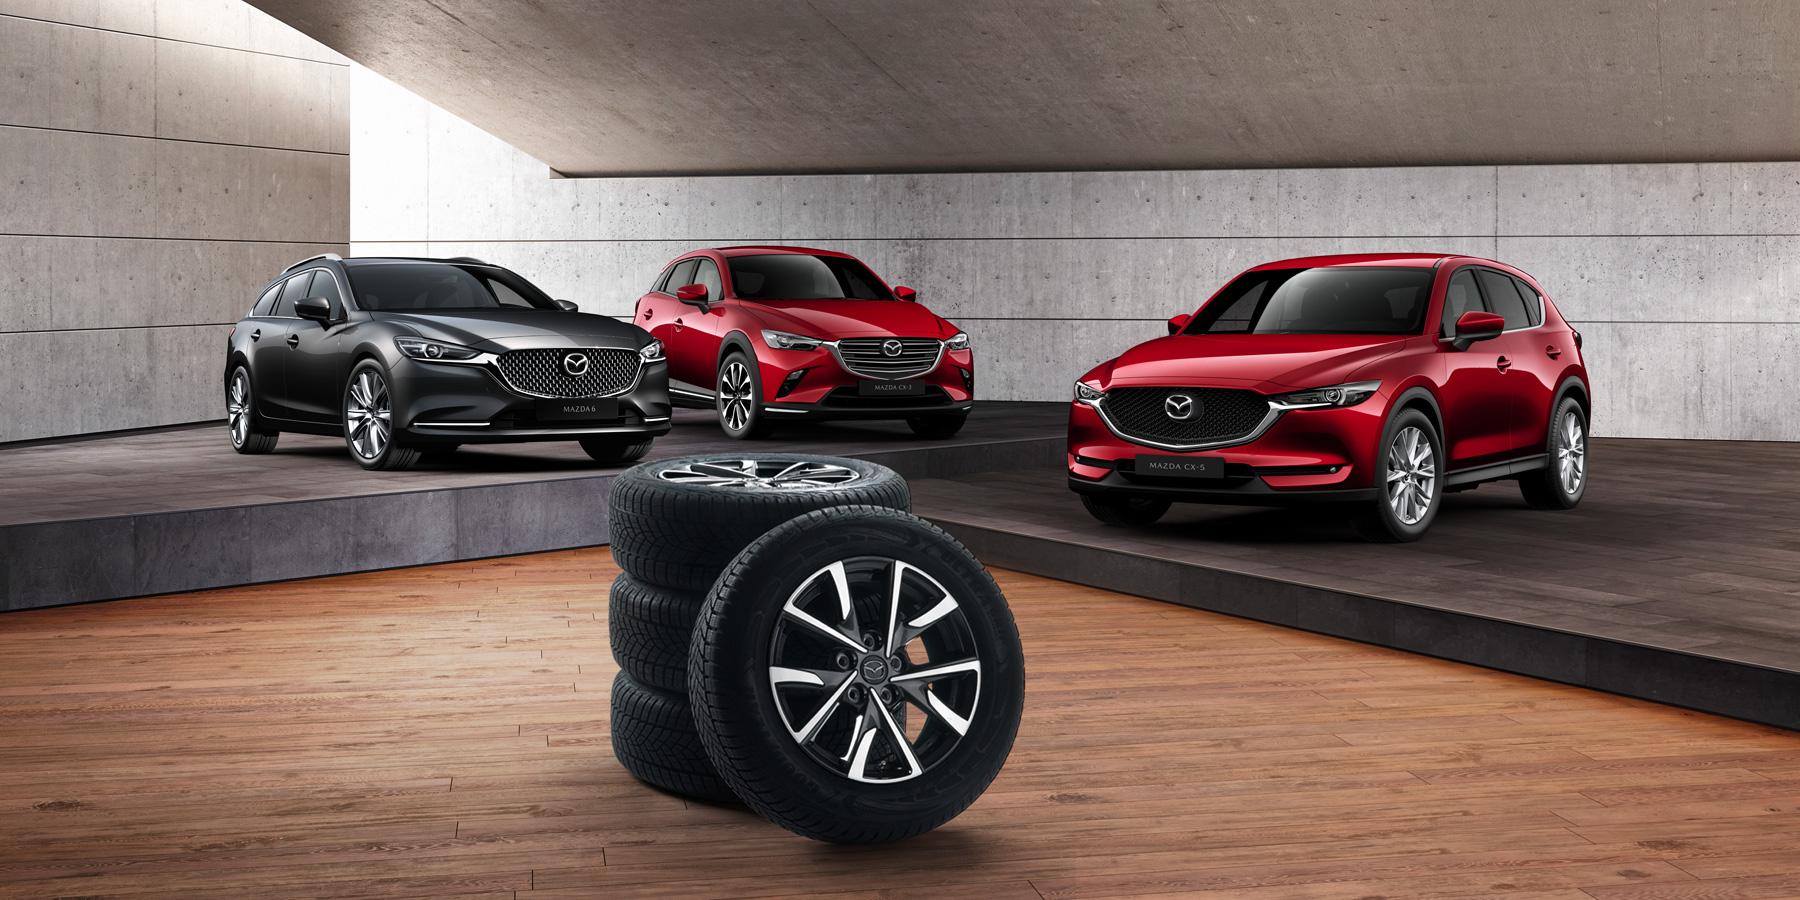 https://maier.mazda.at/wp-content/uploads/sites/53/2019/08/Mazda_ReifenAktion2019_1800x900.jpg